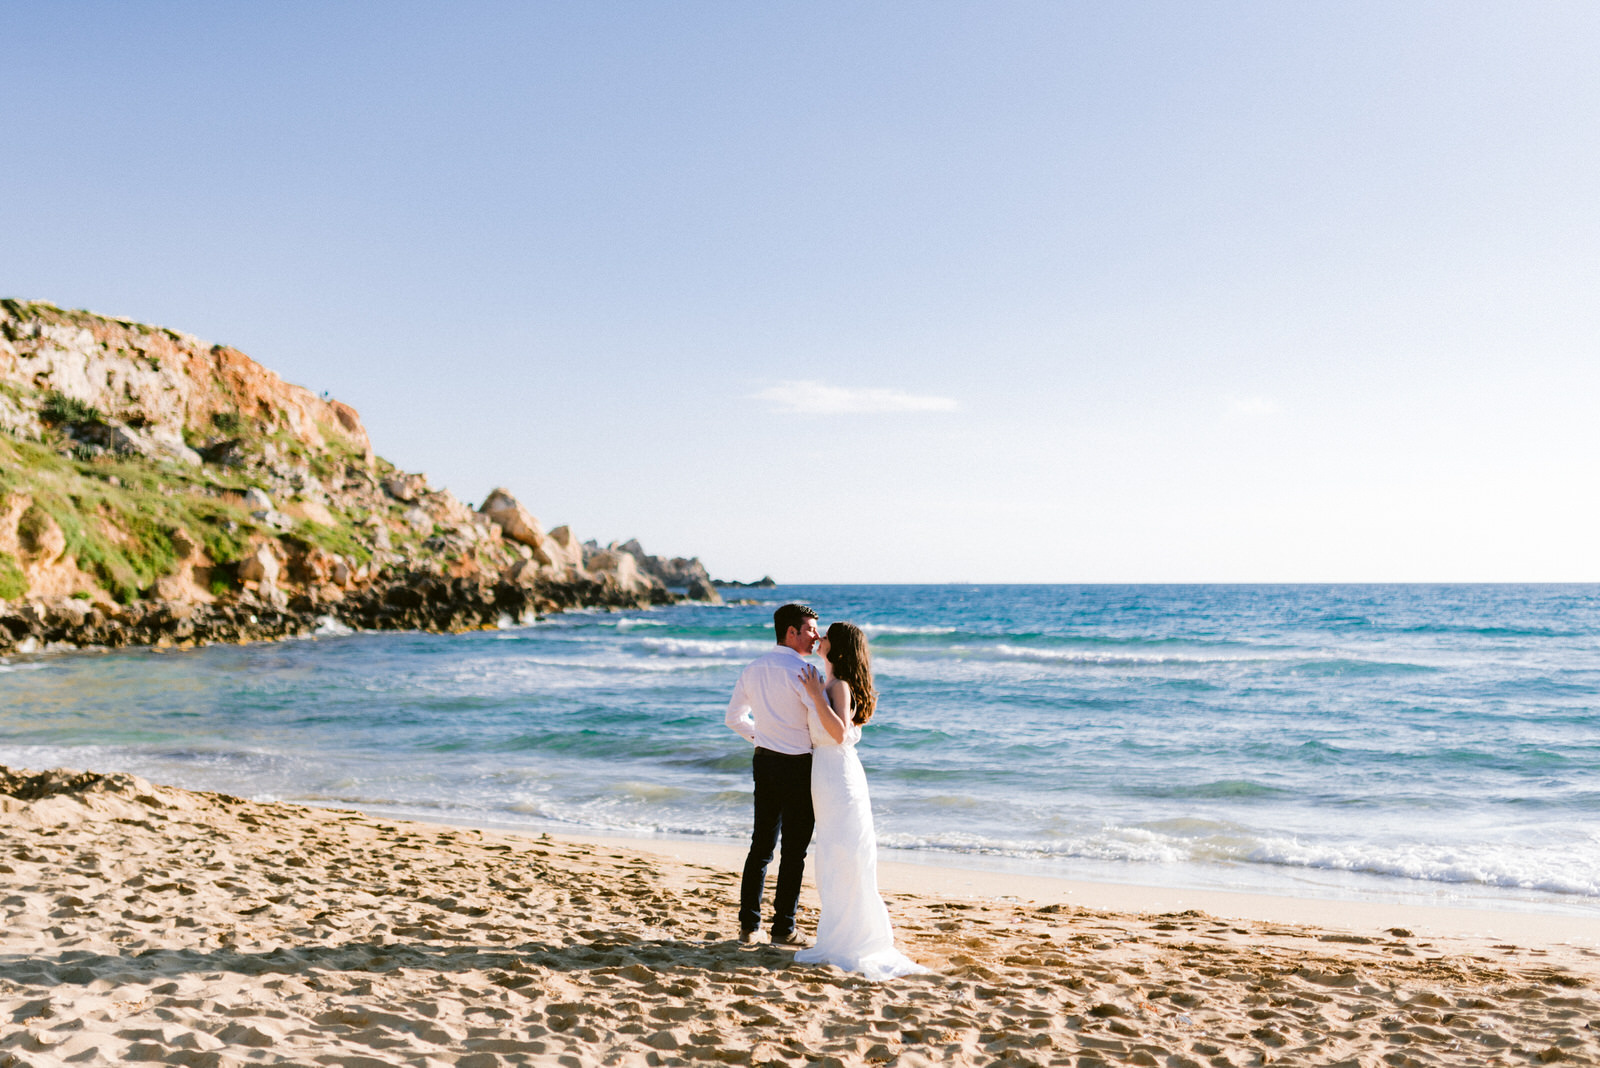 mdina wedding, malta wedding photography, malta elopement, golden bay malta wedding photos, wedding photographer malta, malta wedding venue, villa bologna wedding (65).jpg